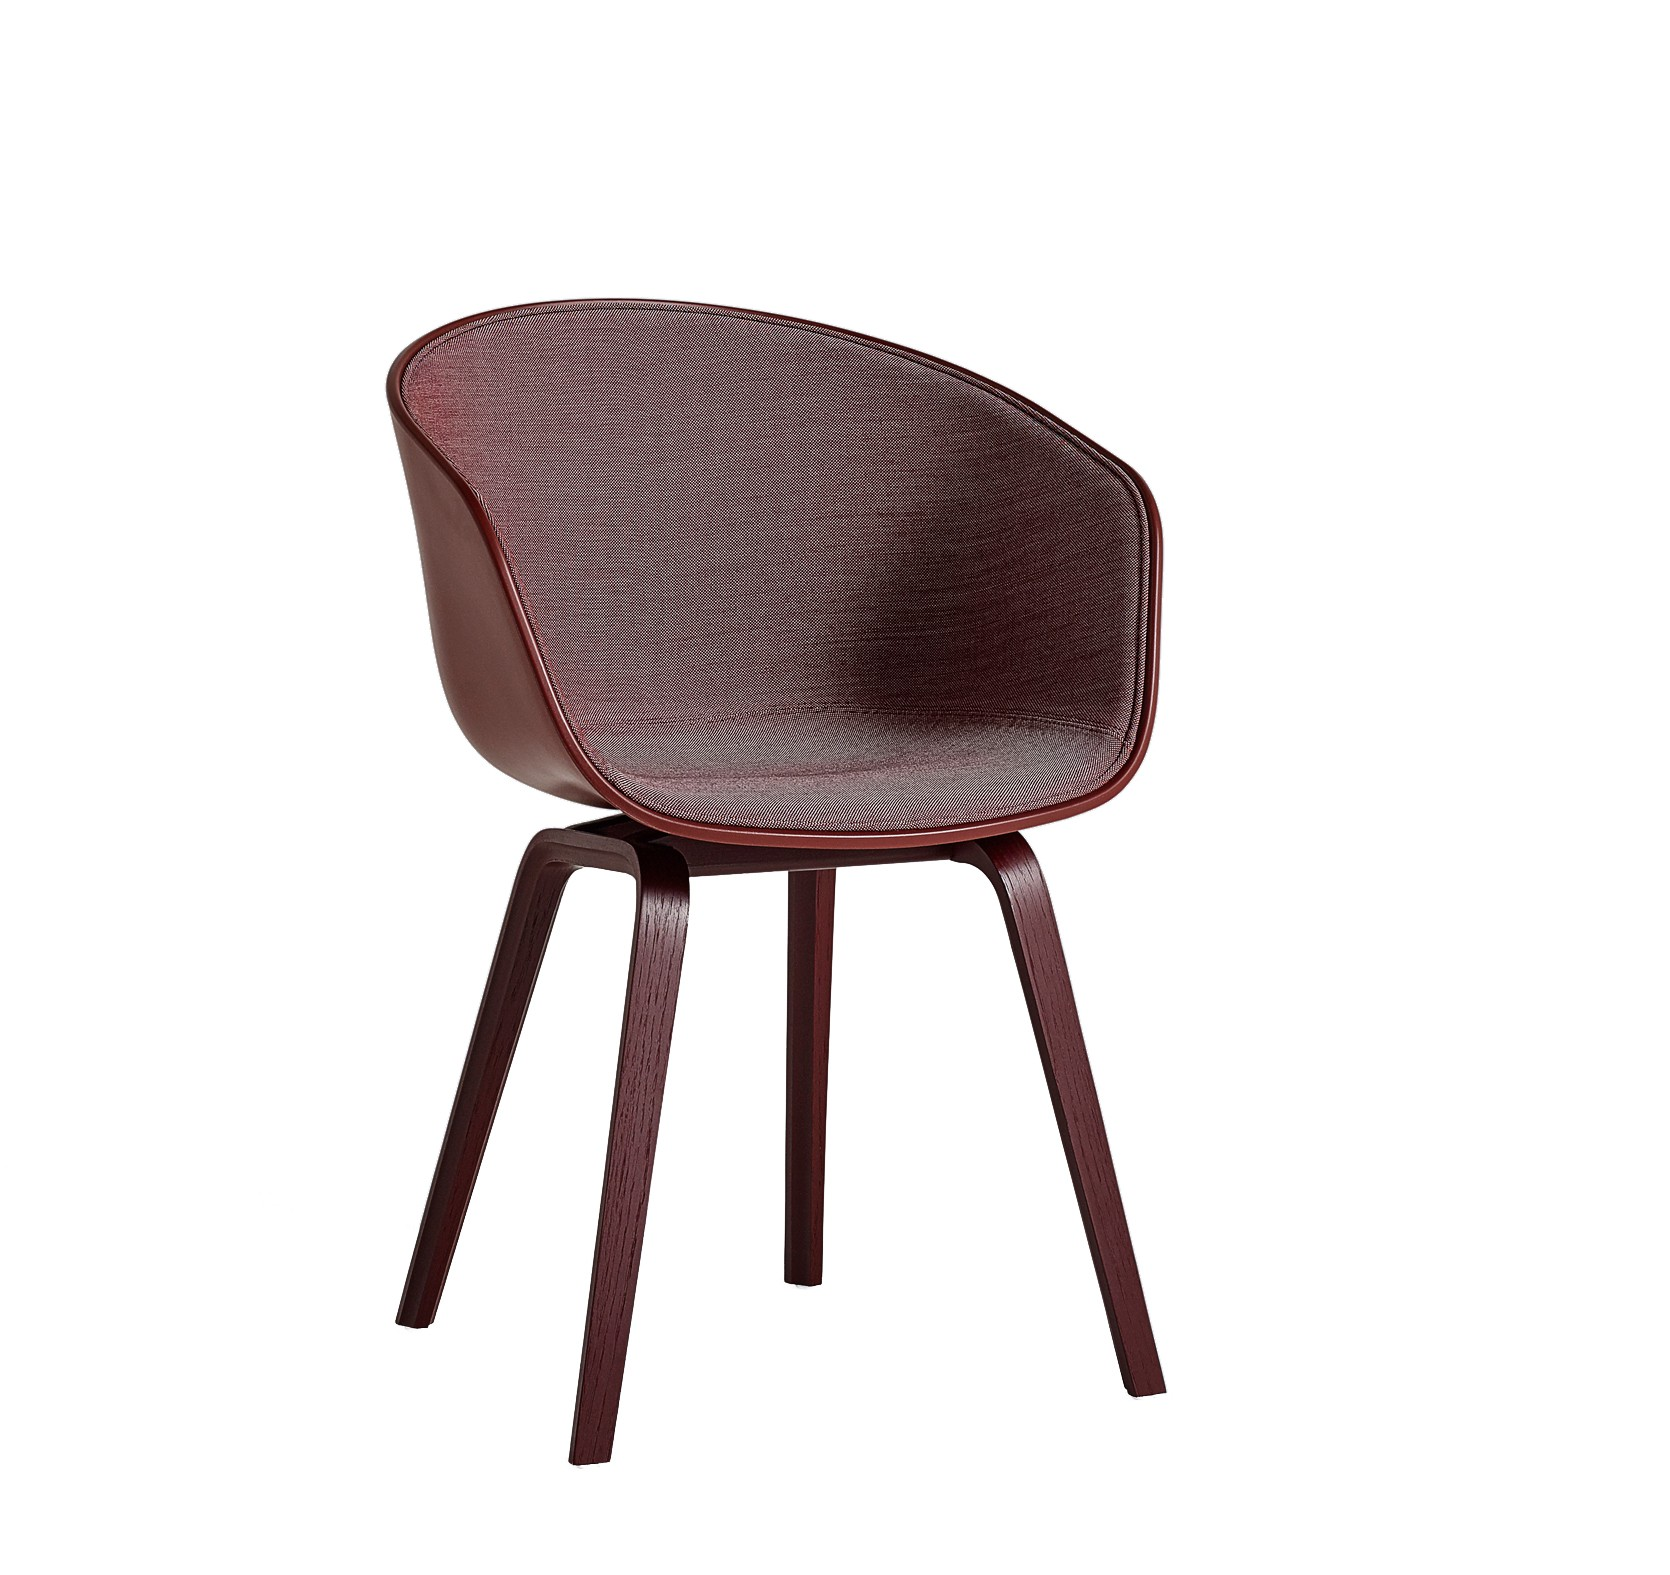 chaise aac22 de hay avec tissu int rieur surface brick. Black Bedroom Furniture Sets. Home Design Ideas